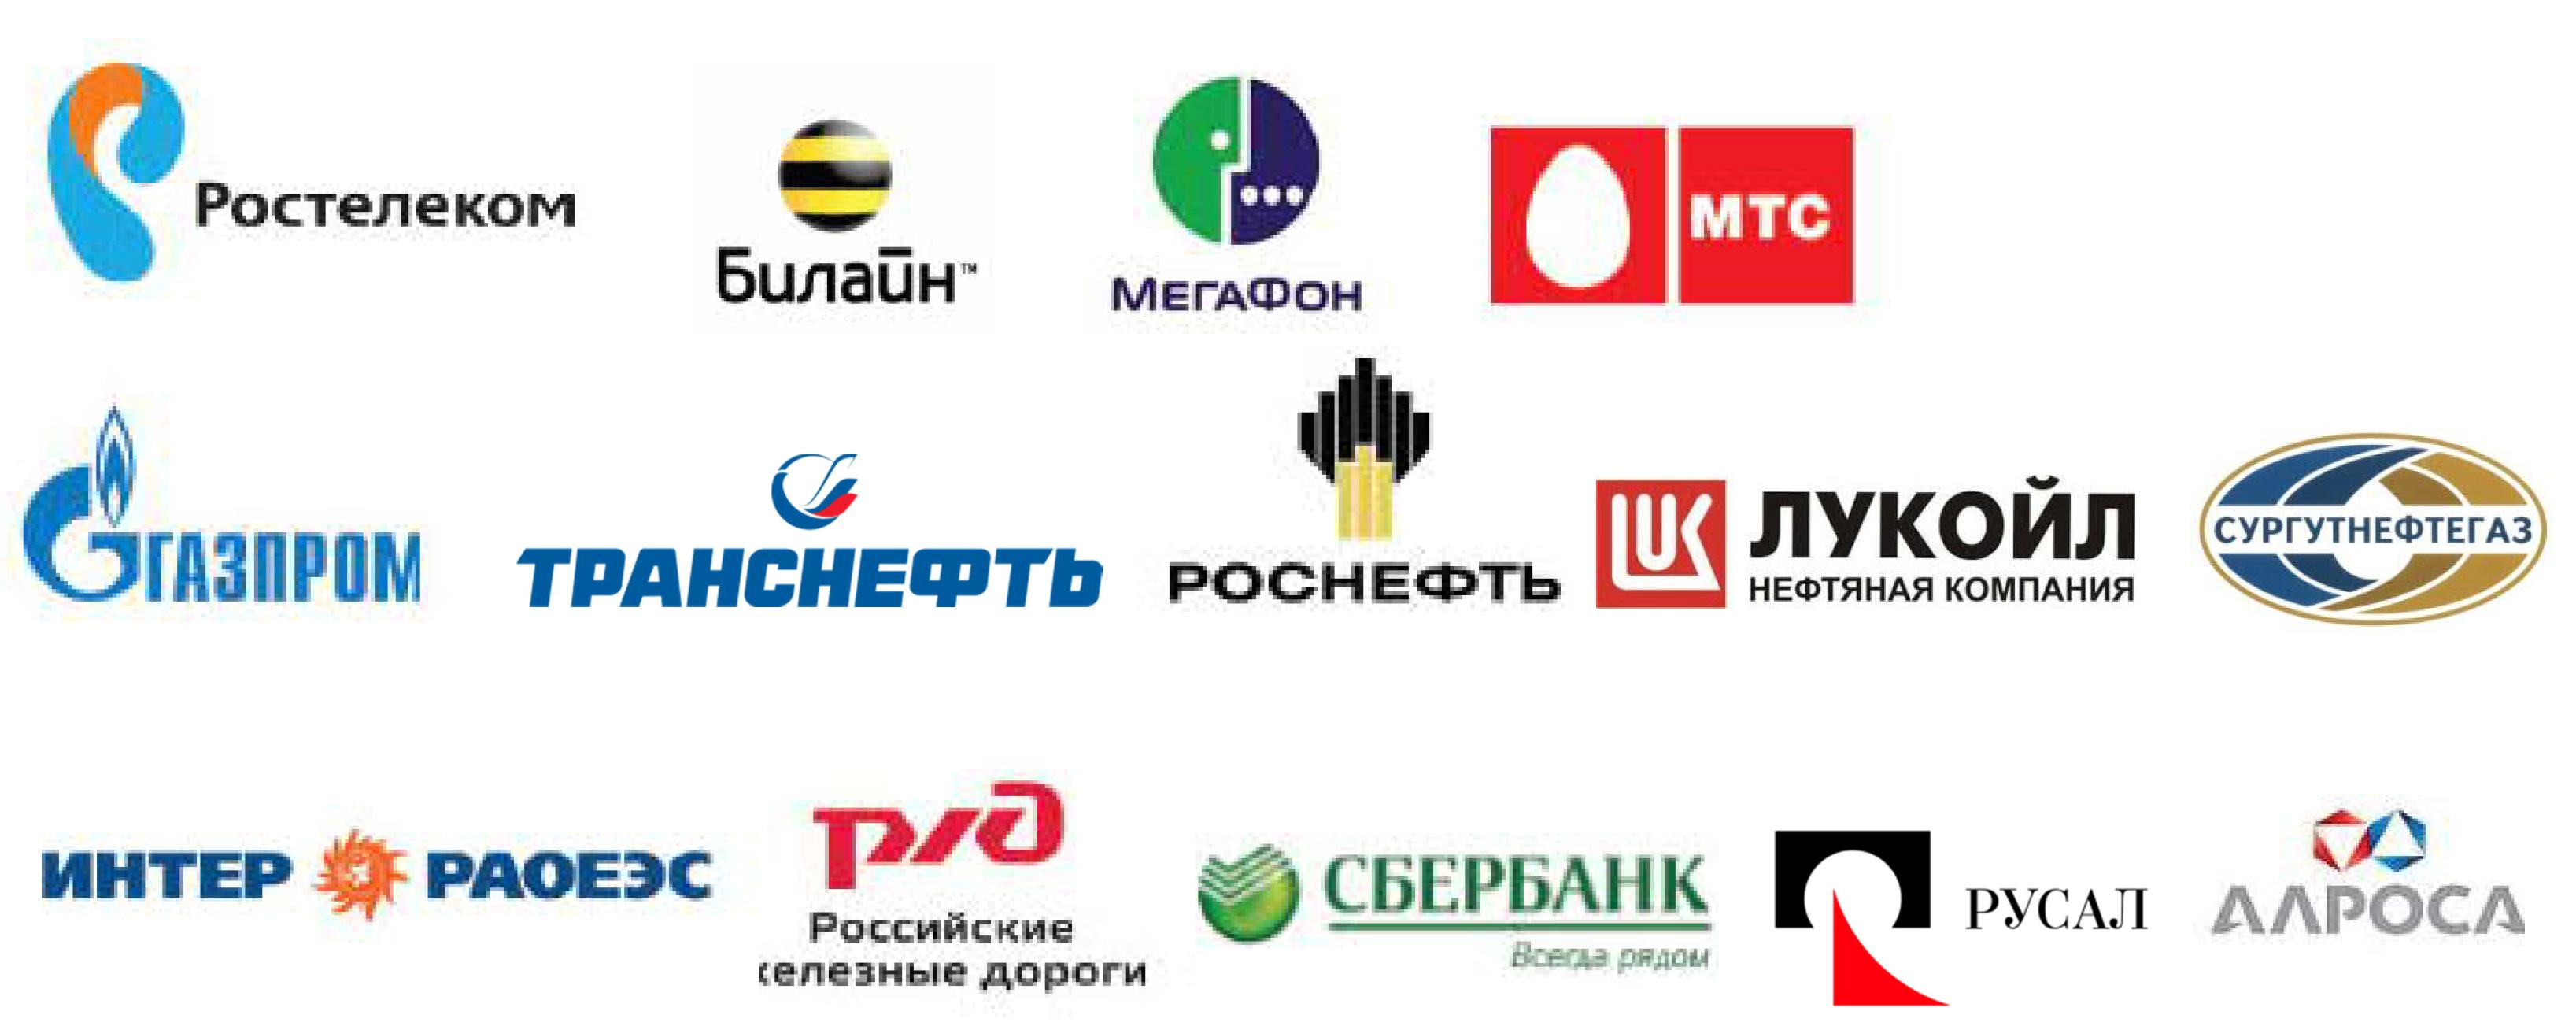 Клиенты компаний 4VOLS.RU